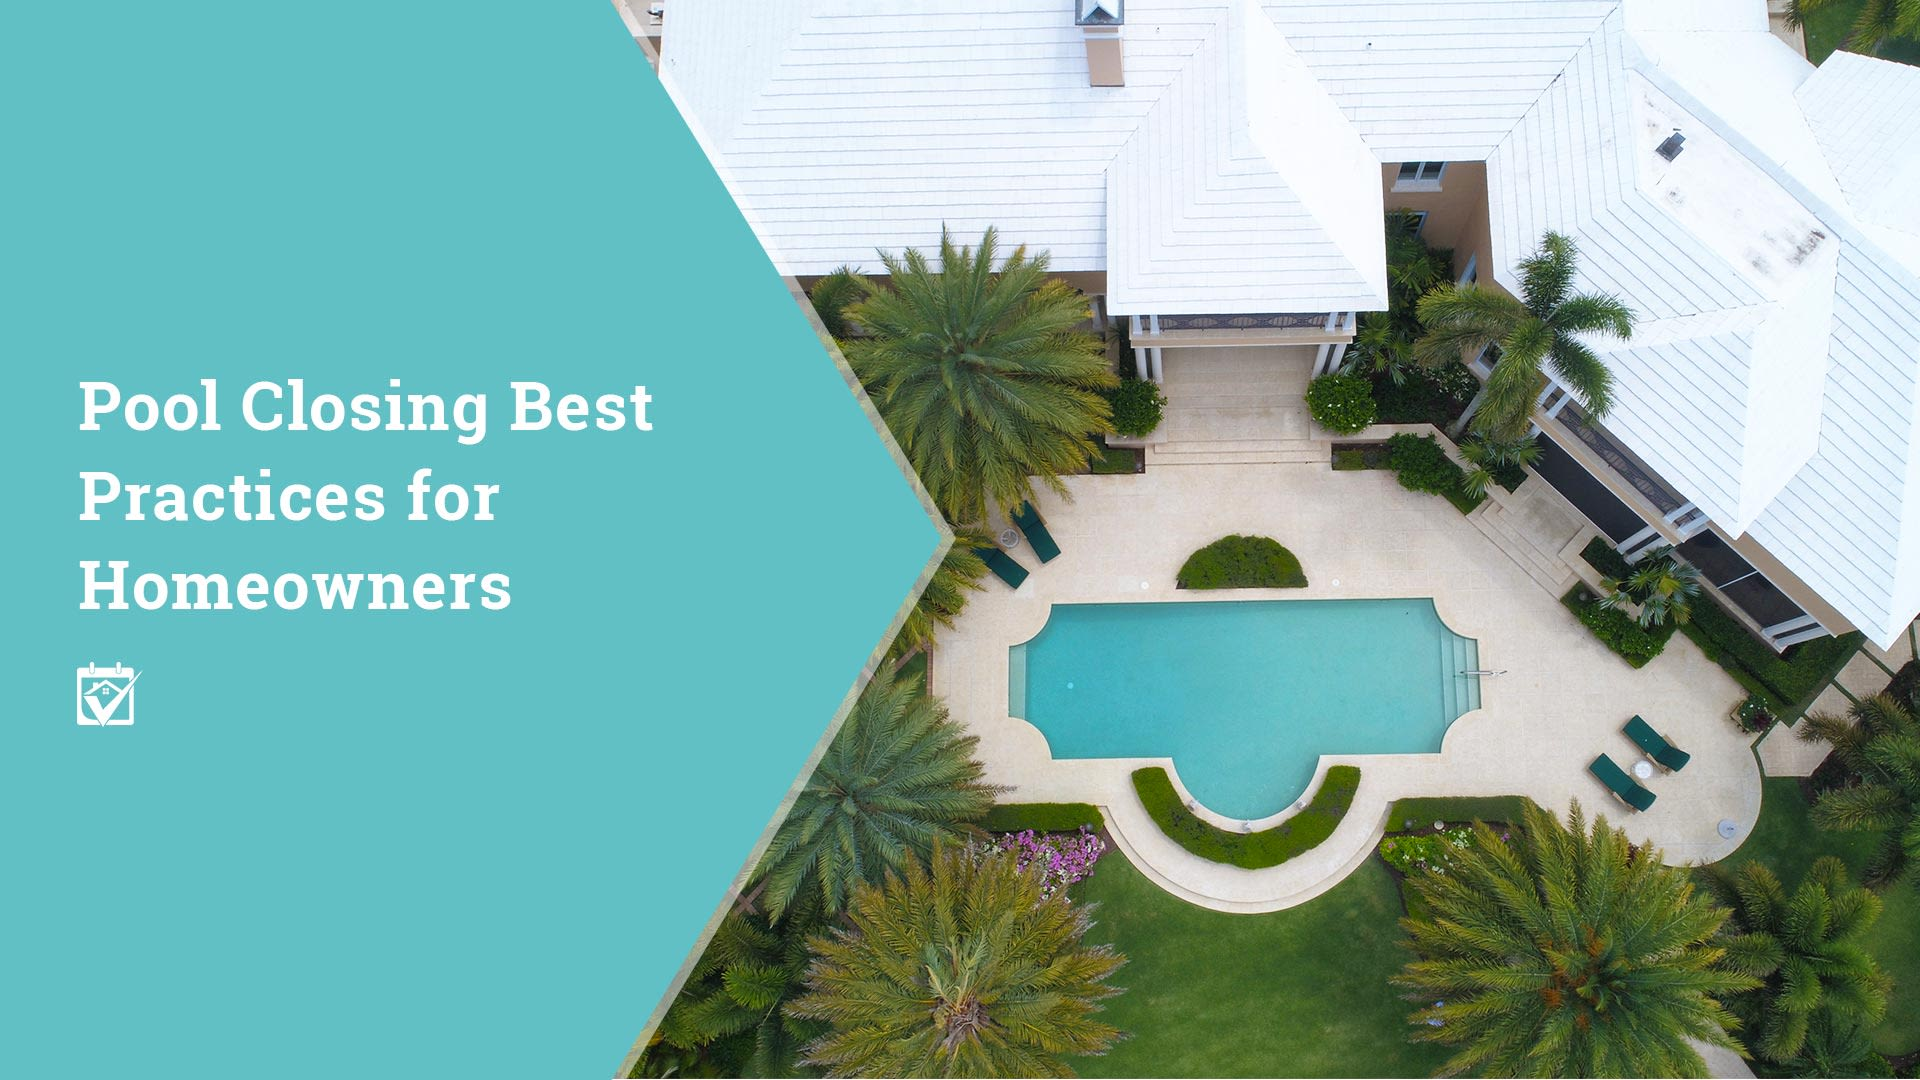 Pool Closing Best Practices for Homeowners – from HomeKeepr